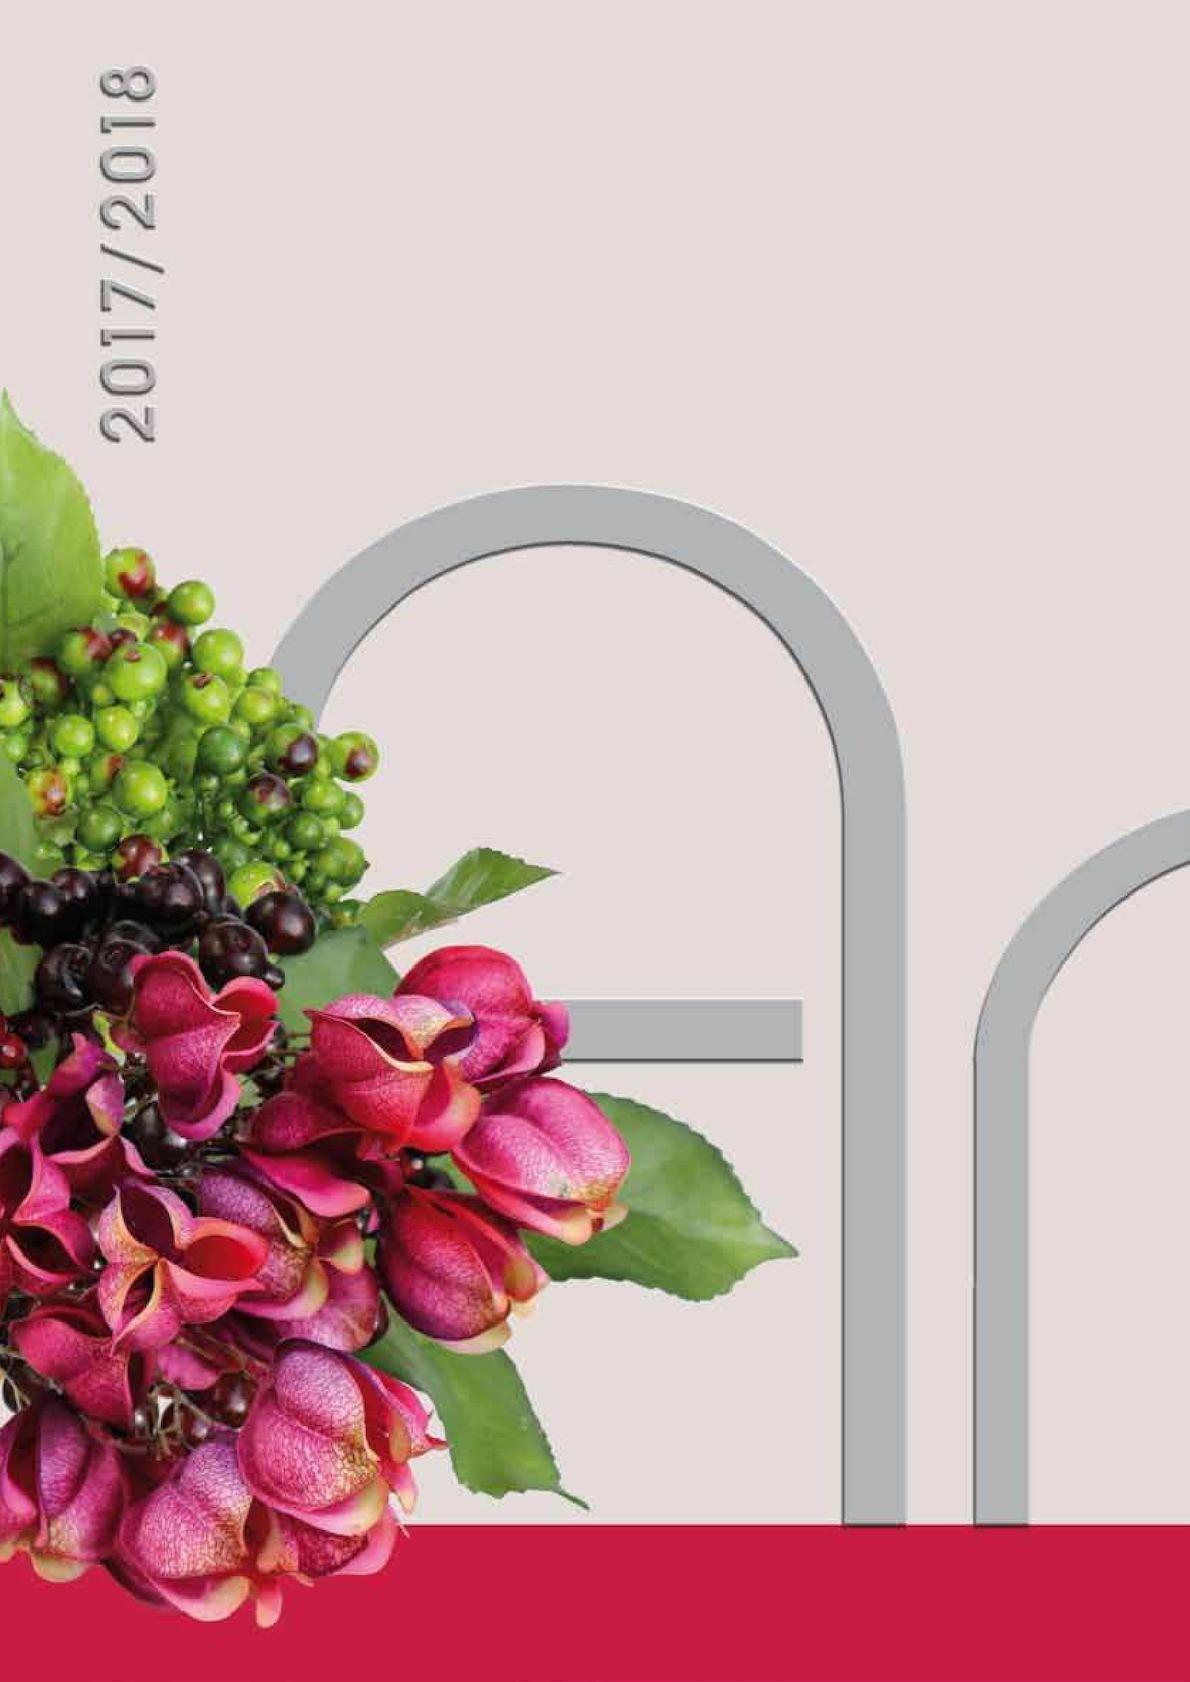 01 Frühling Katalog2017 18 Seite 1 73 .